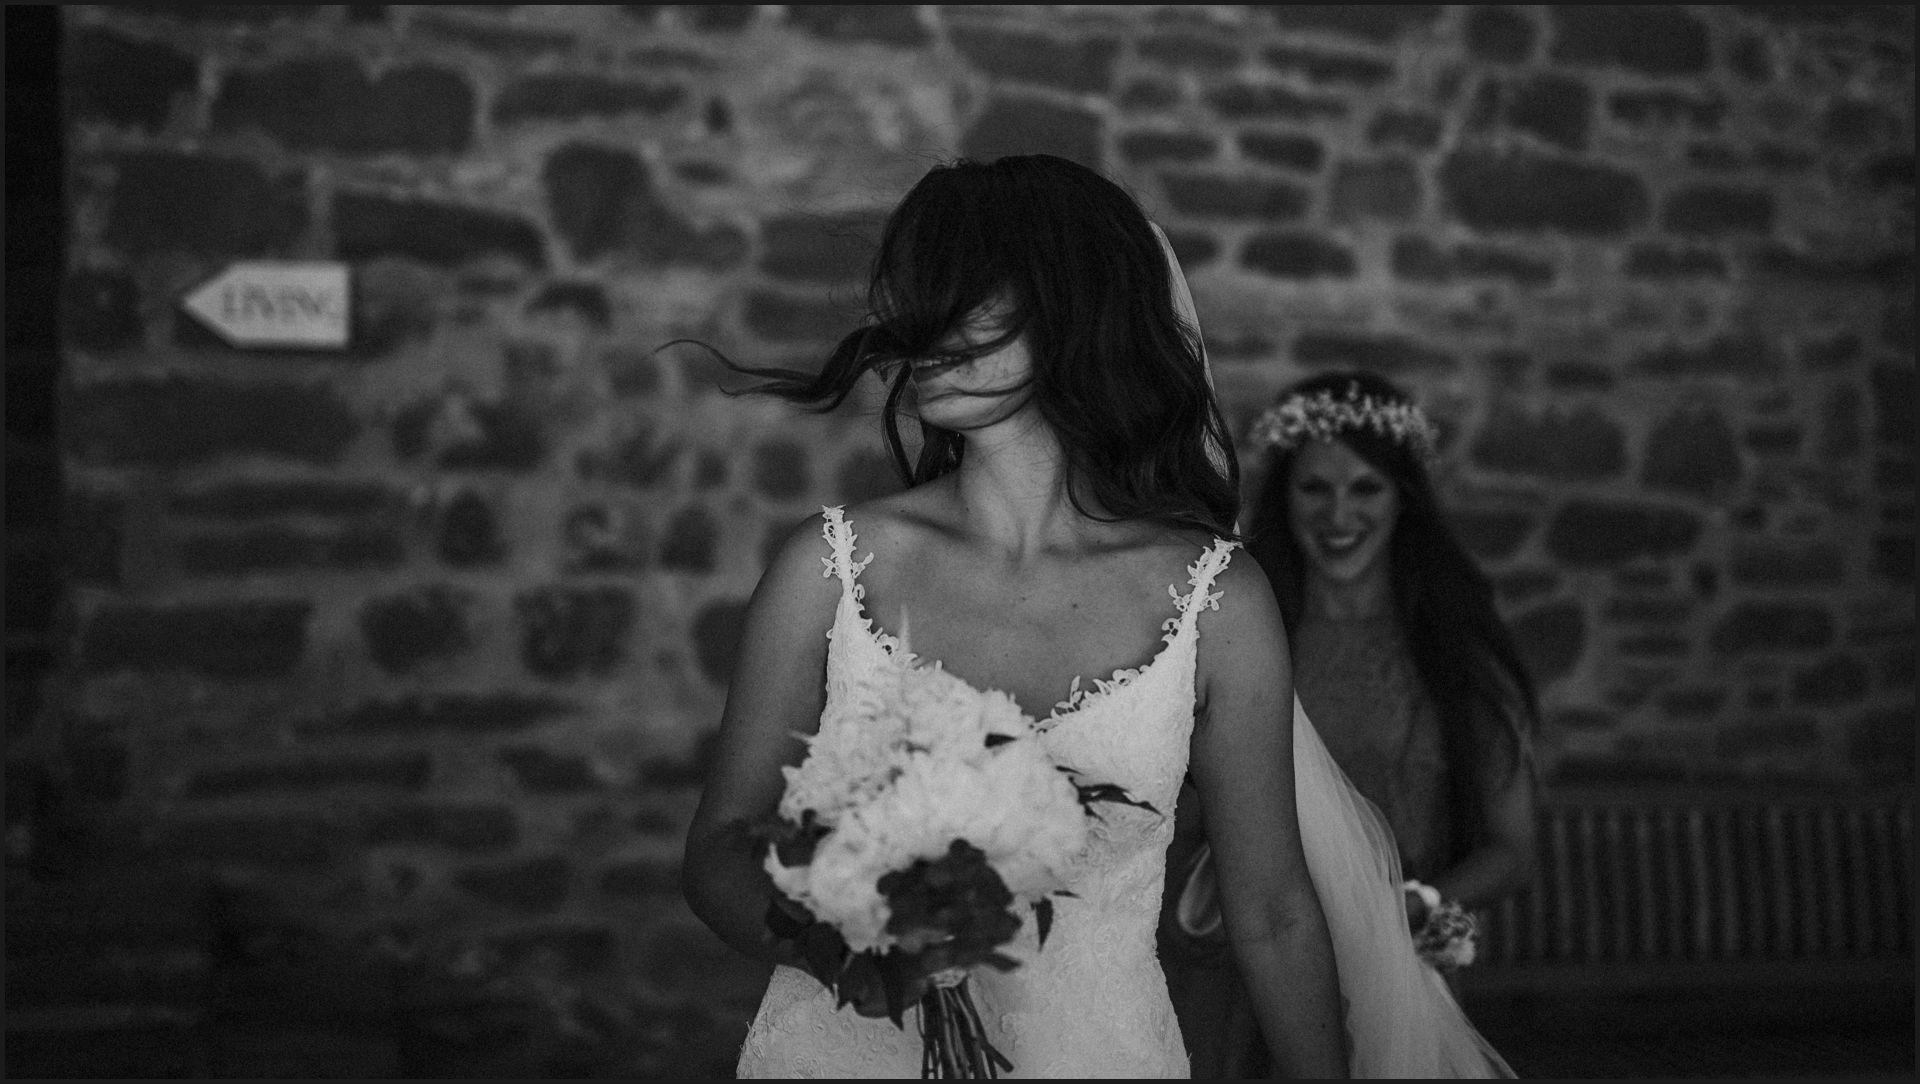 black and white, portrait, wind, hair, wedding, bride, umbria, nikis resort